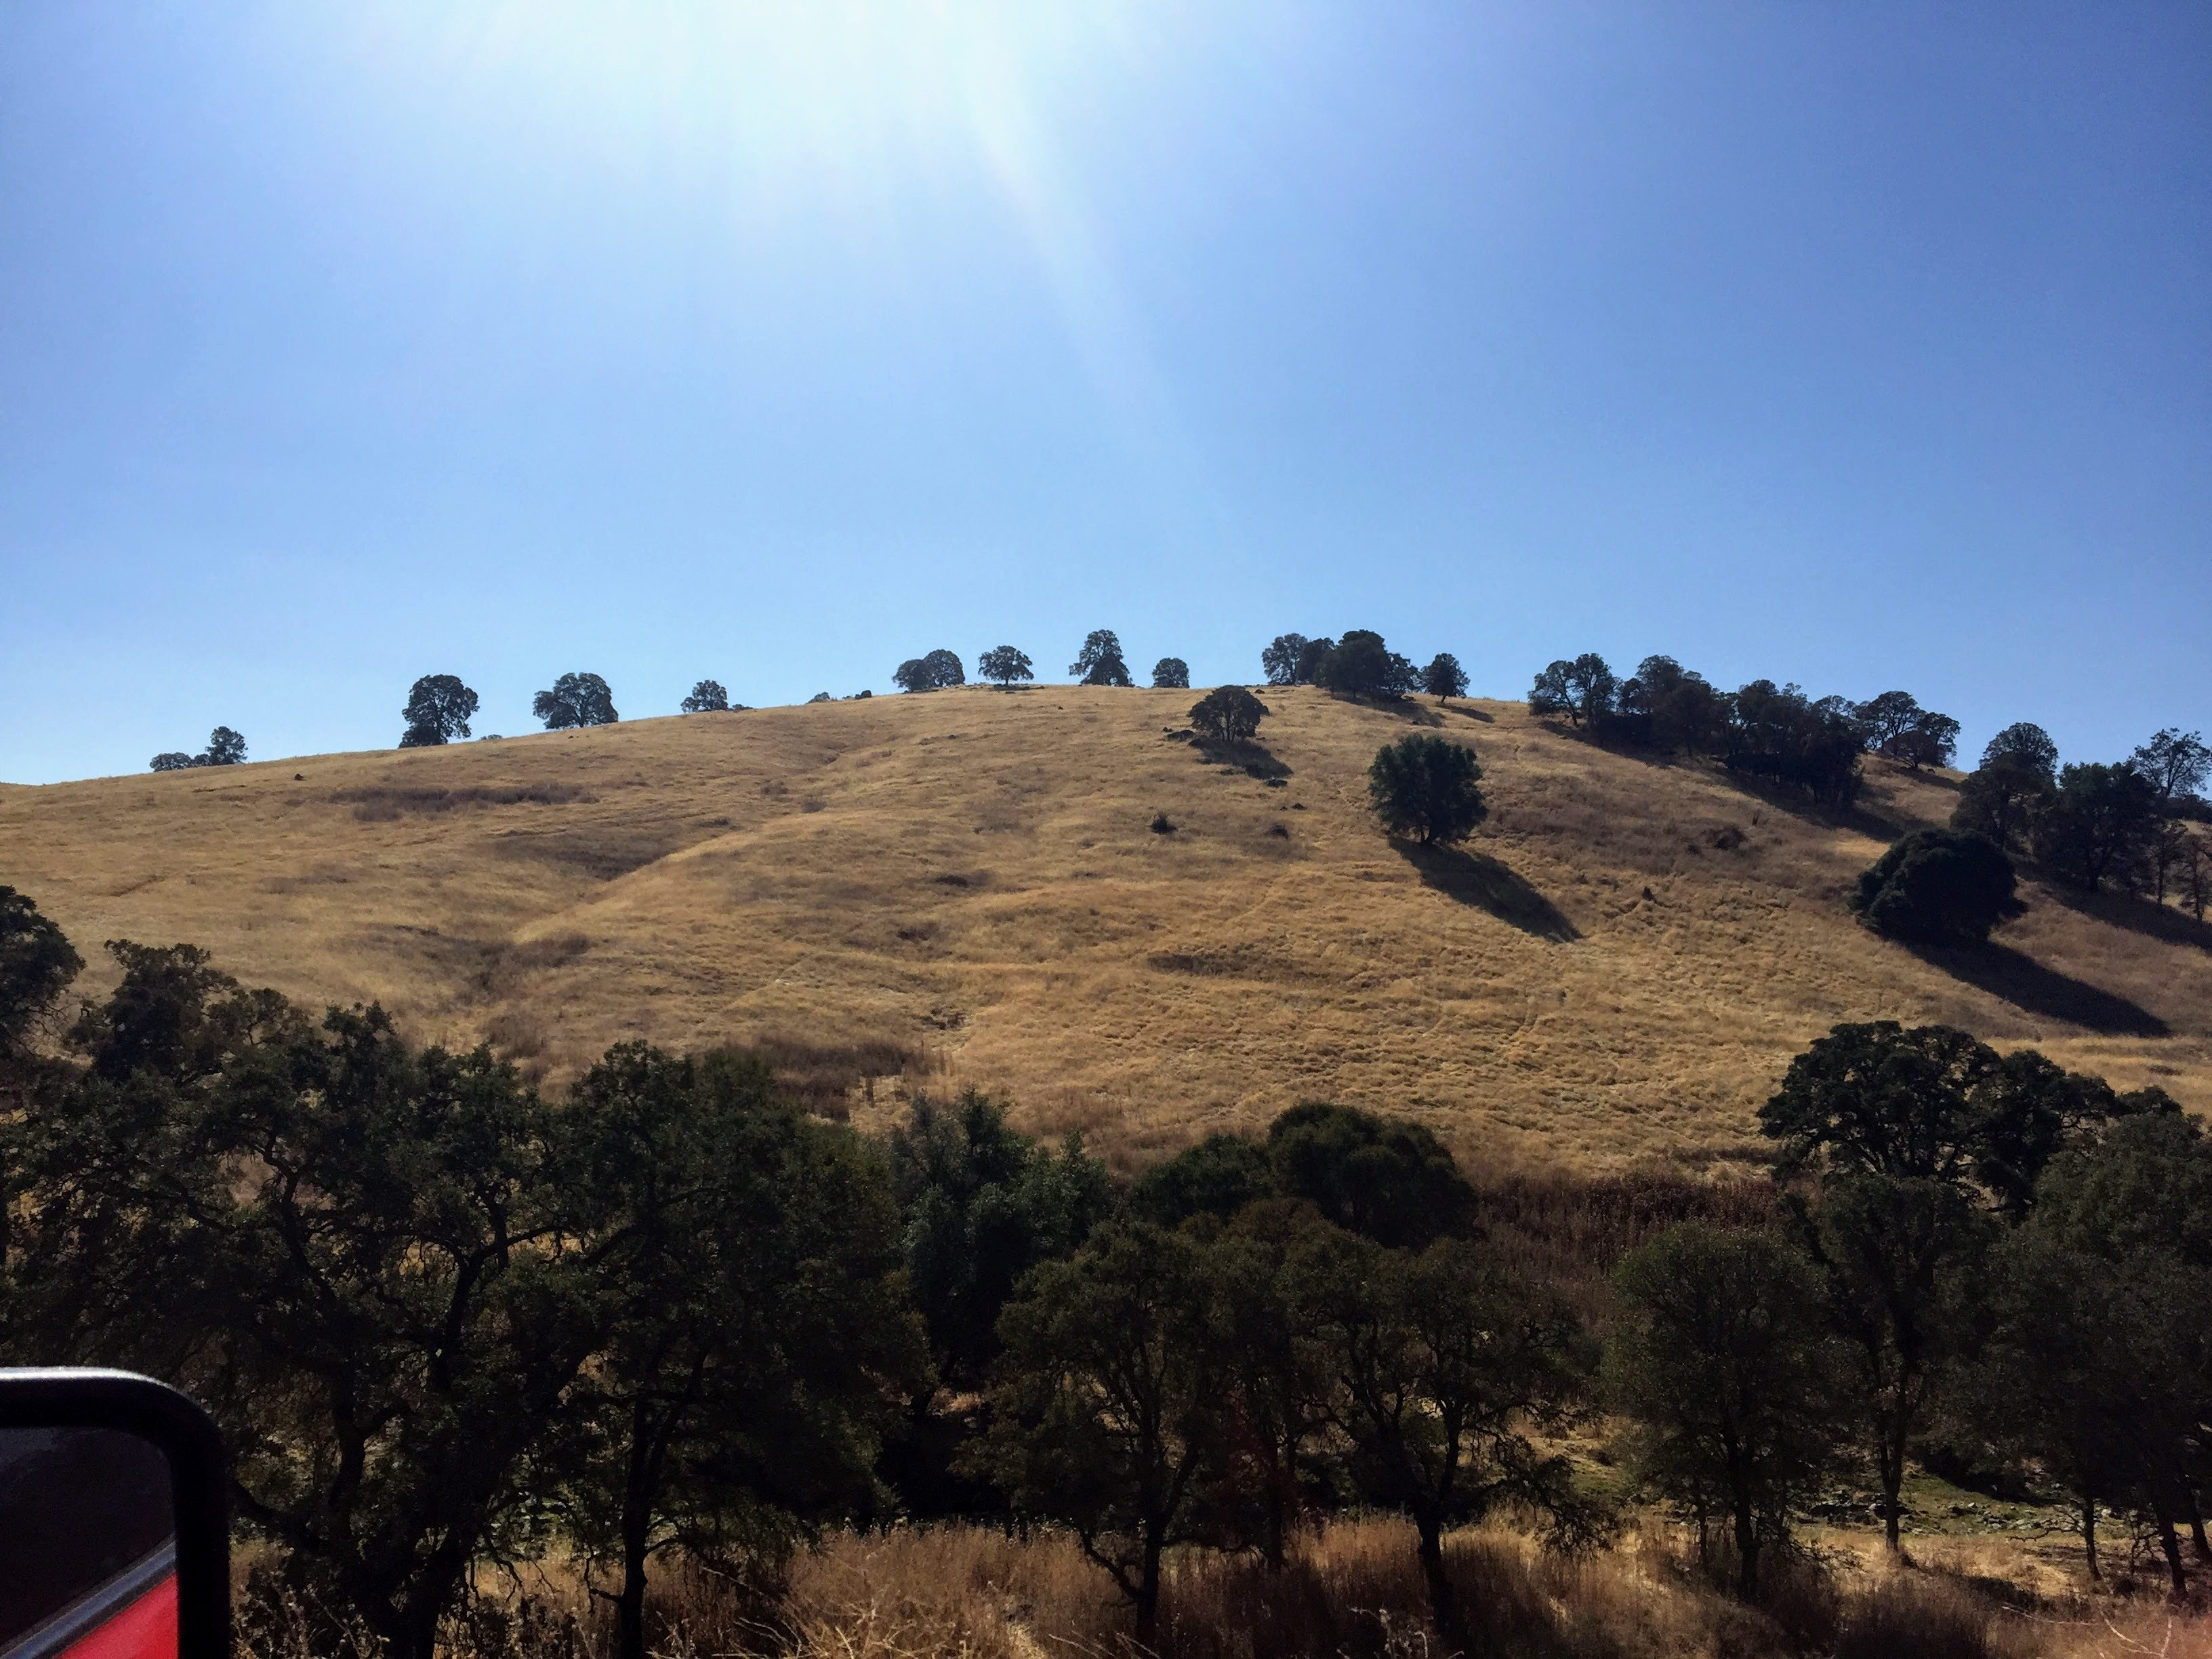 2017-10-14 California 01 Views 02